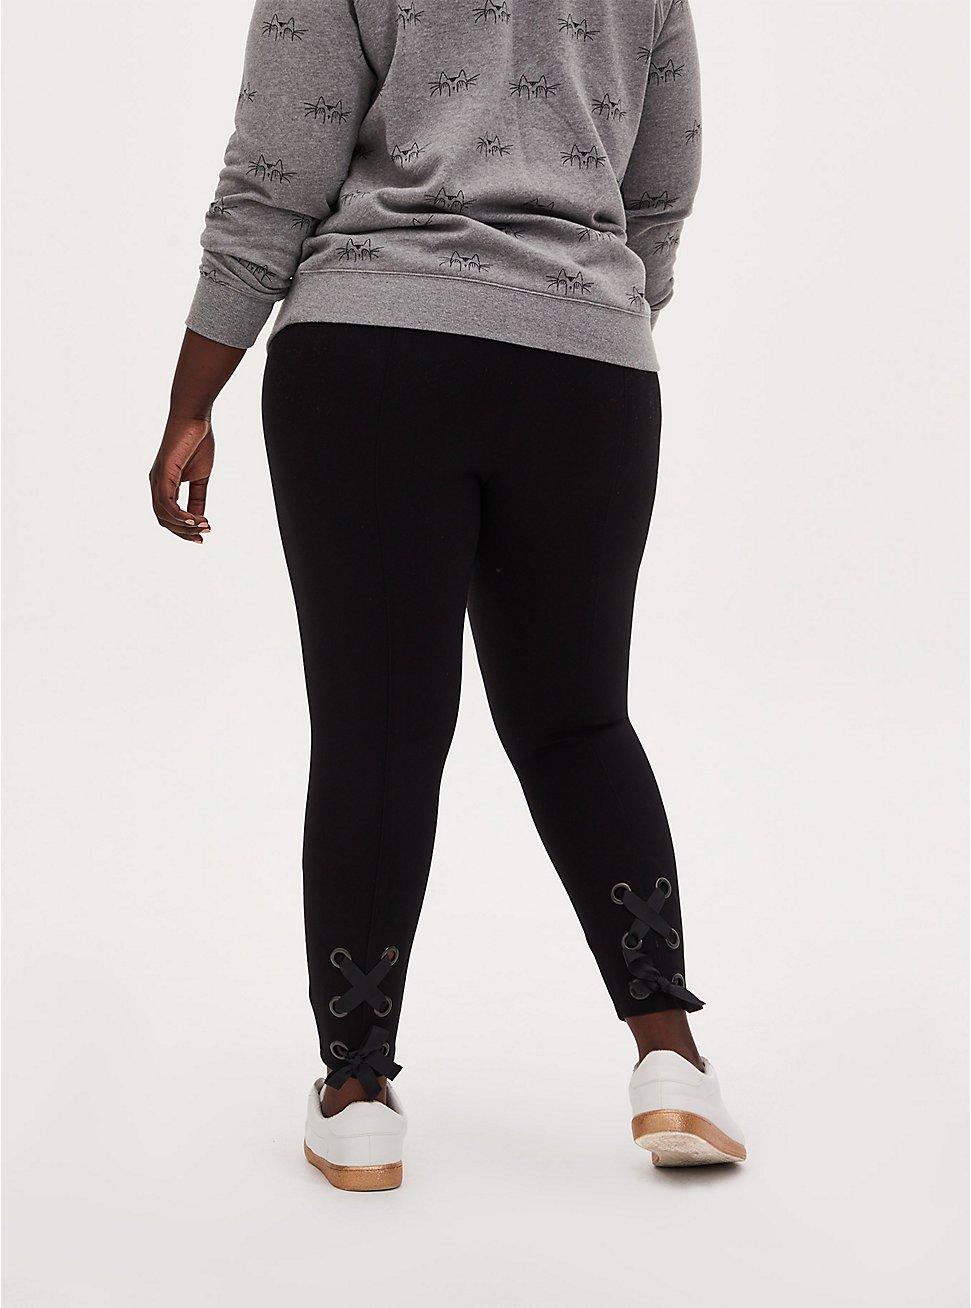 Studio Ponte Slim Fix Black Lace-Up Pull-On Crop Pixie Pant, DEEP BLACK, hi-res